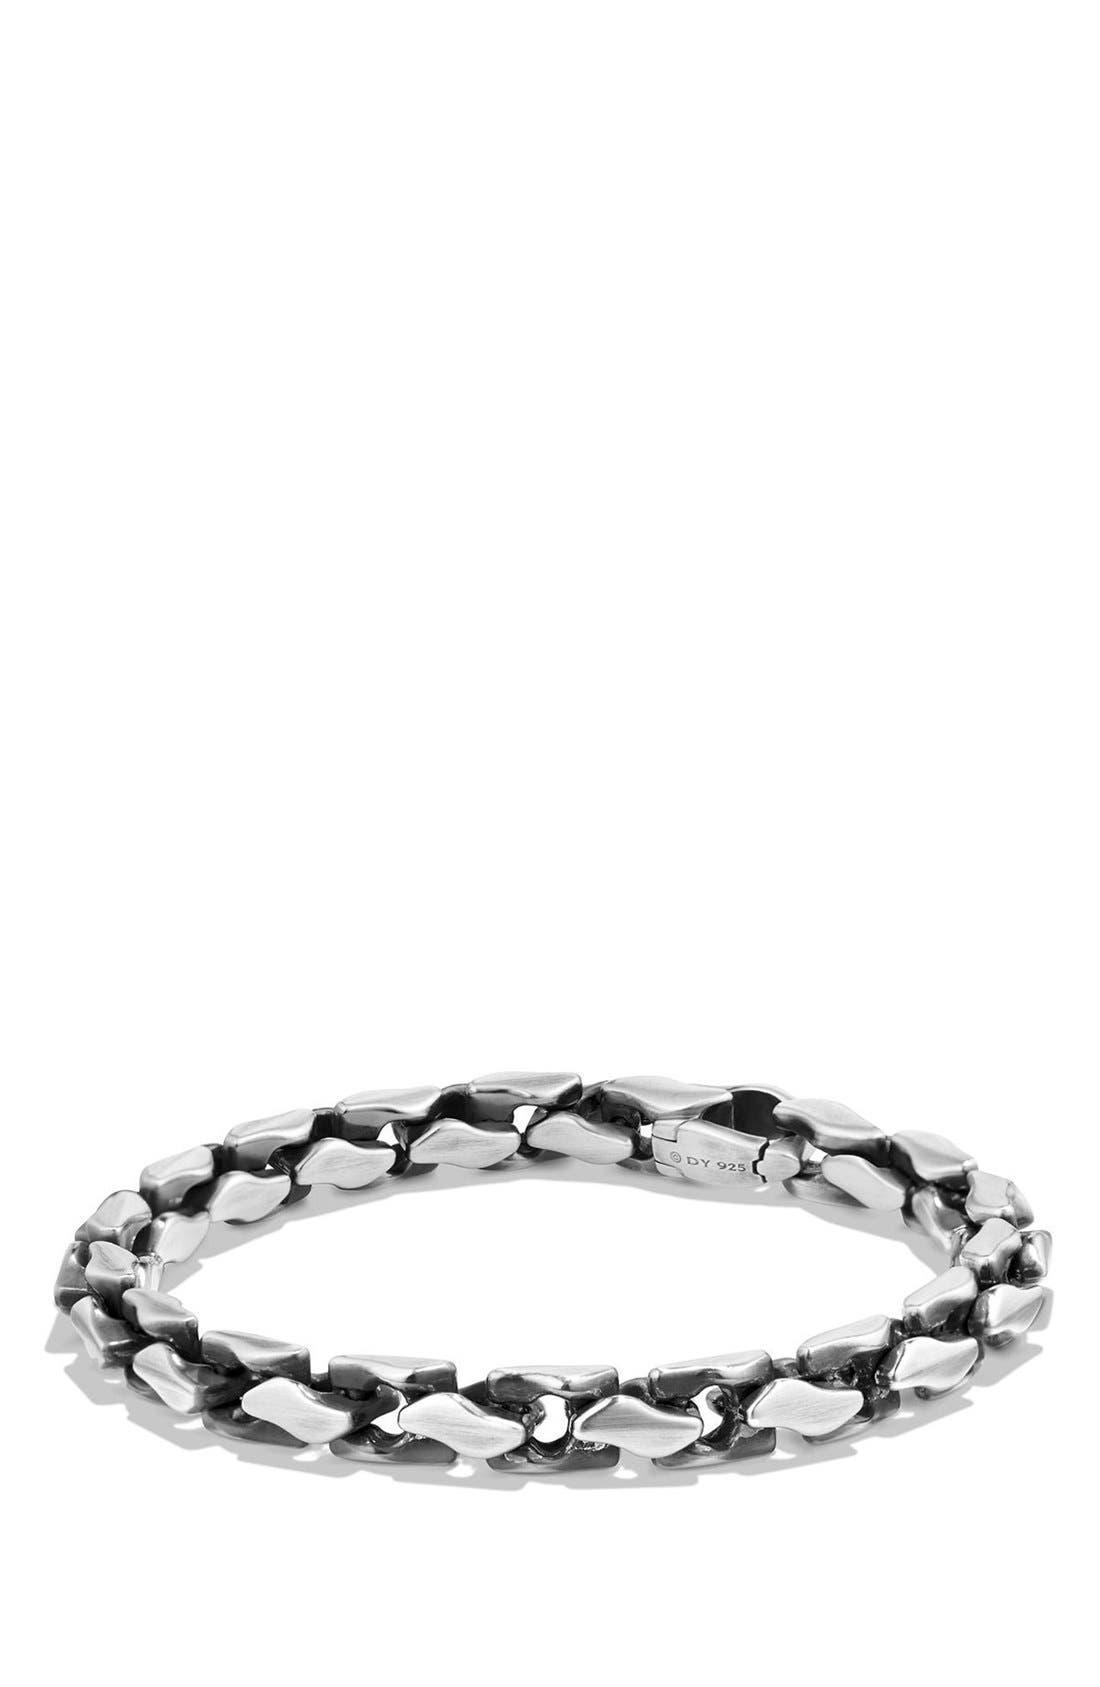 David Yurman 'Chain' Large Fluted Chain Bracelet